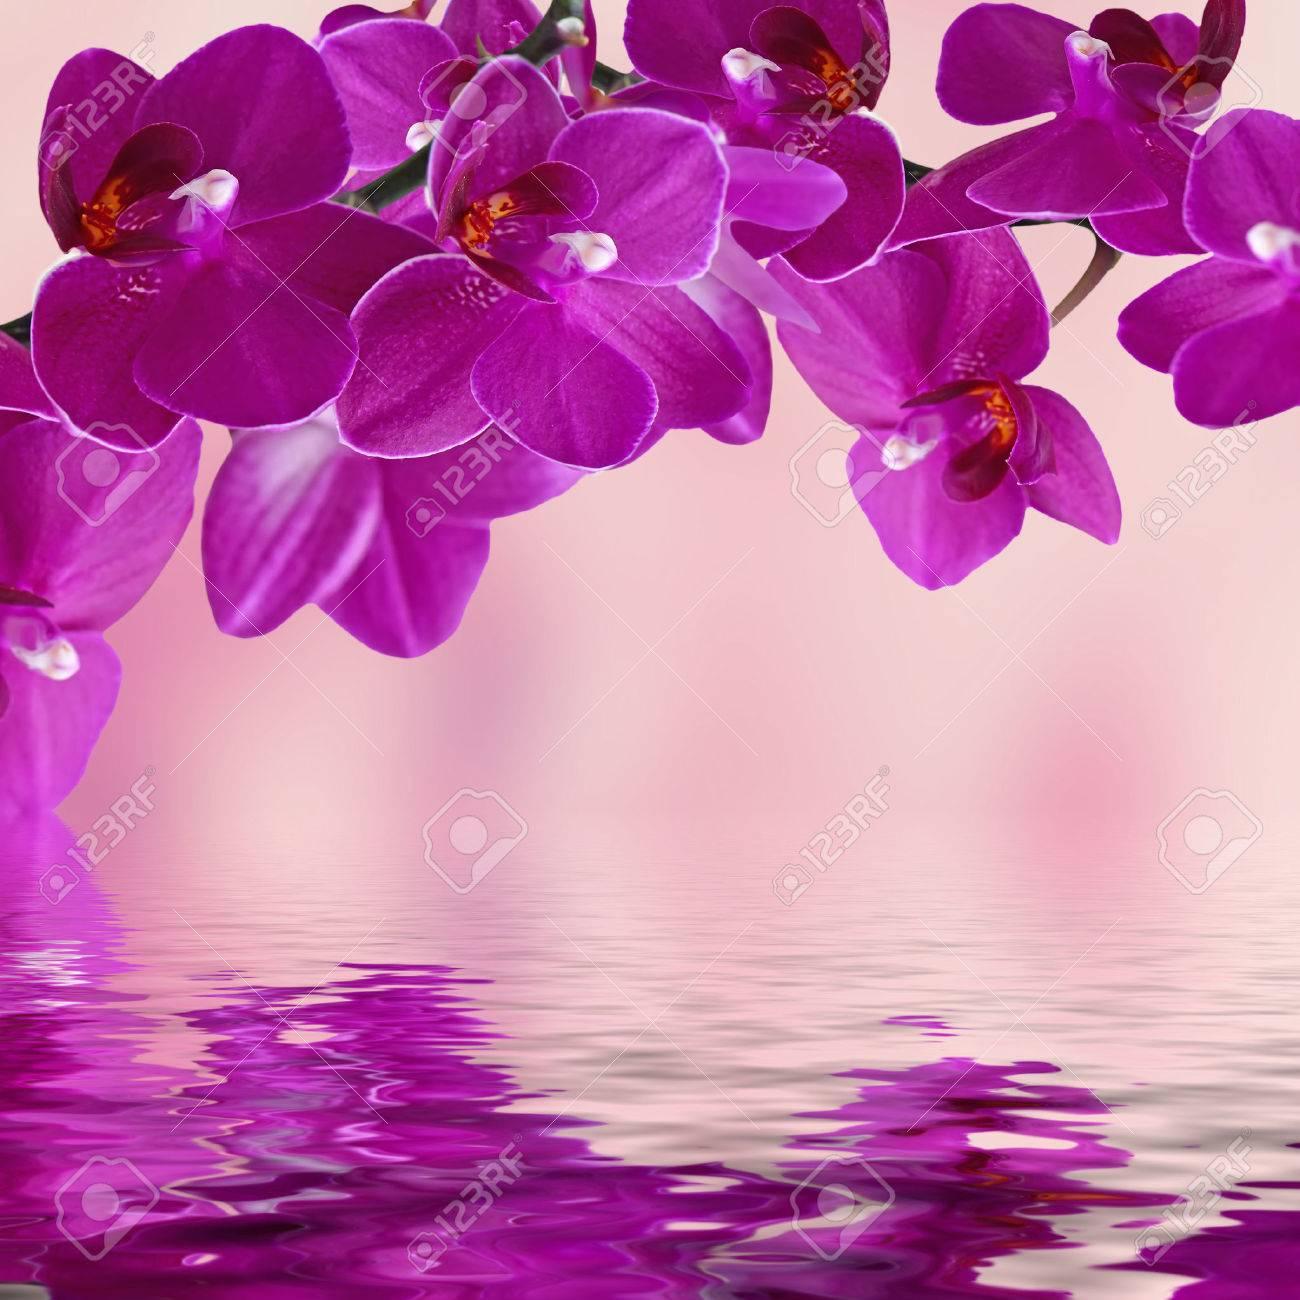 close up de color rosa orquídea ramo de flores de orquídeas se